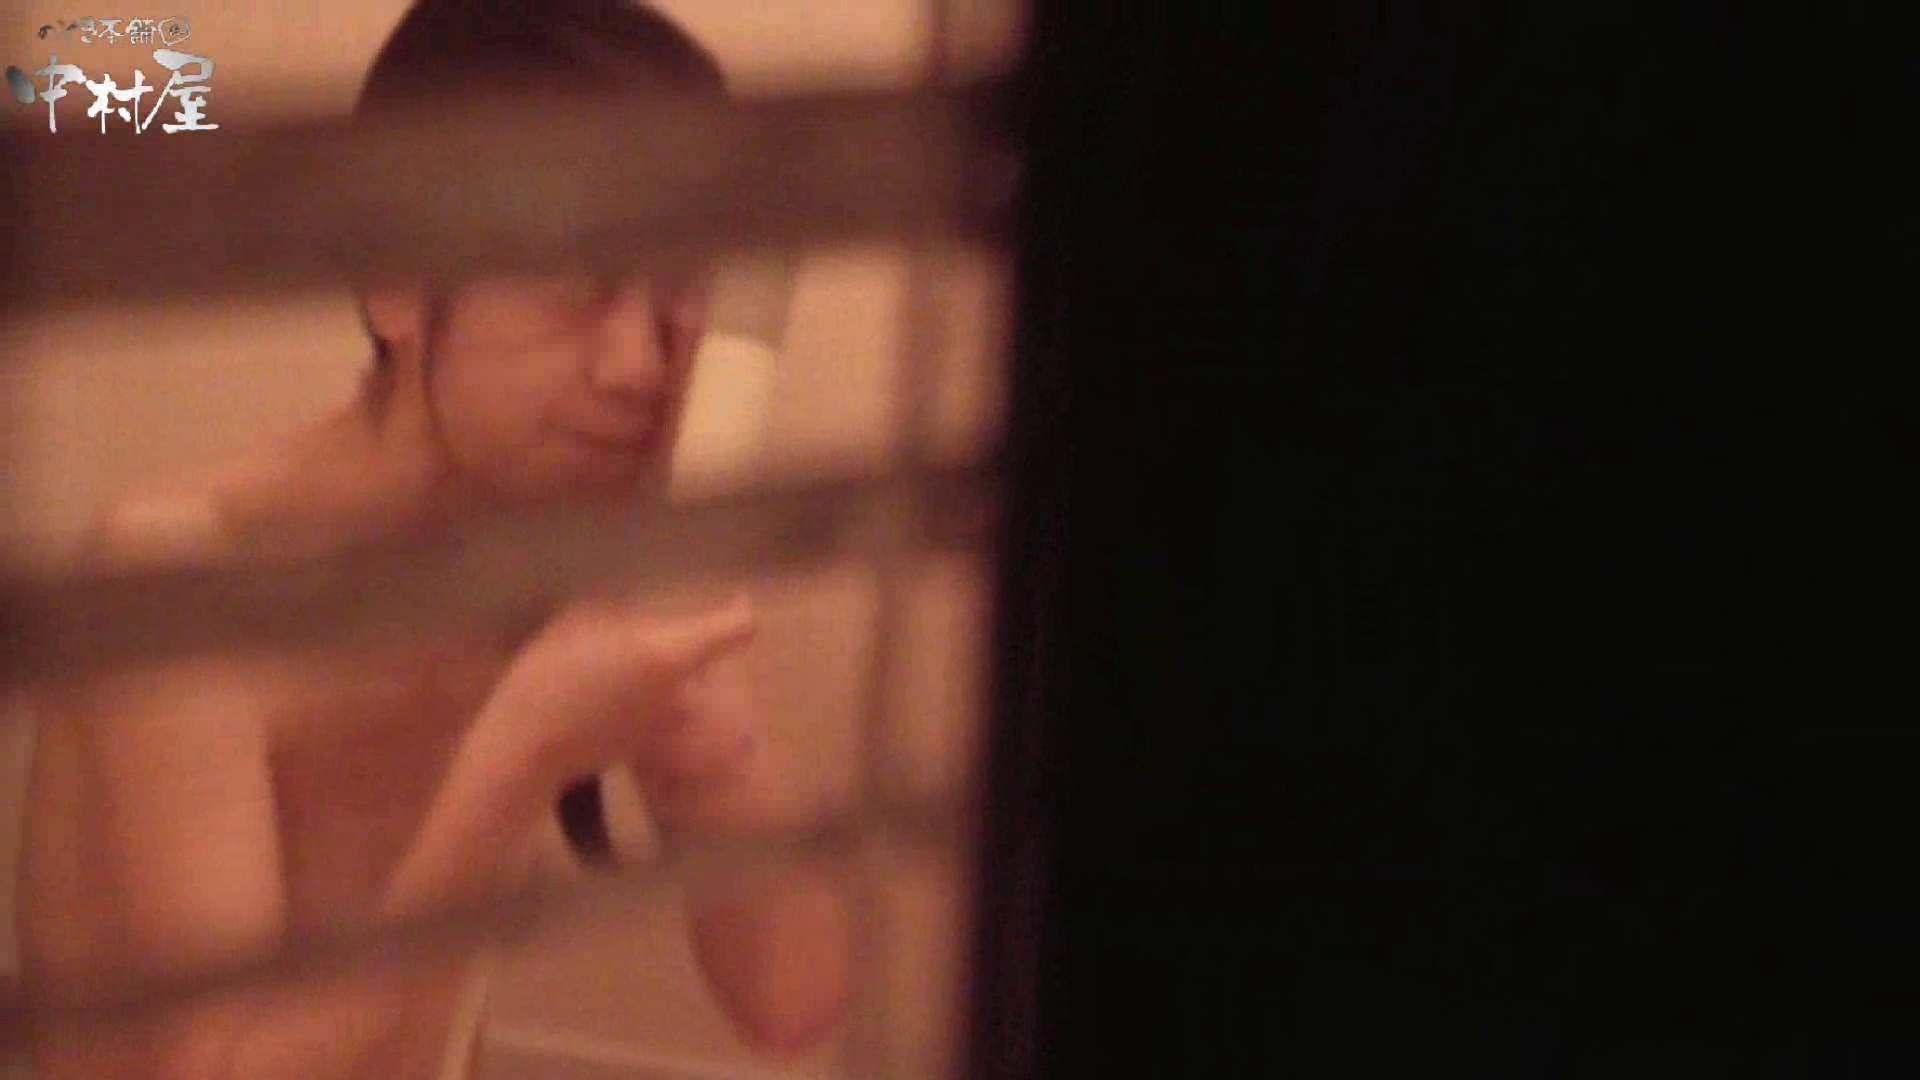 民家風呂専門盗撮師の超危険映像 vol.012 民家シリーズ エロ無料画像 89PIX 48